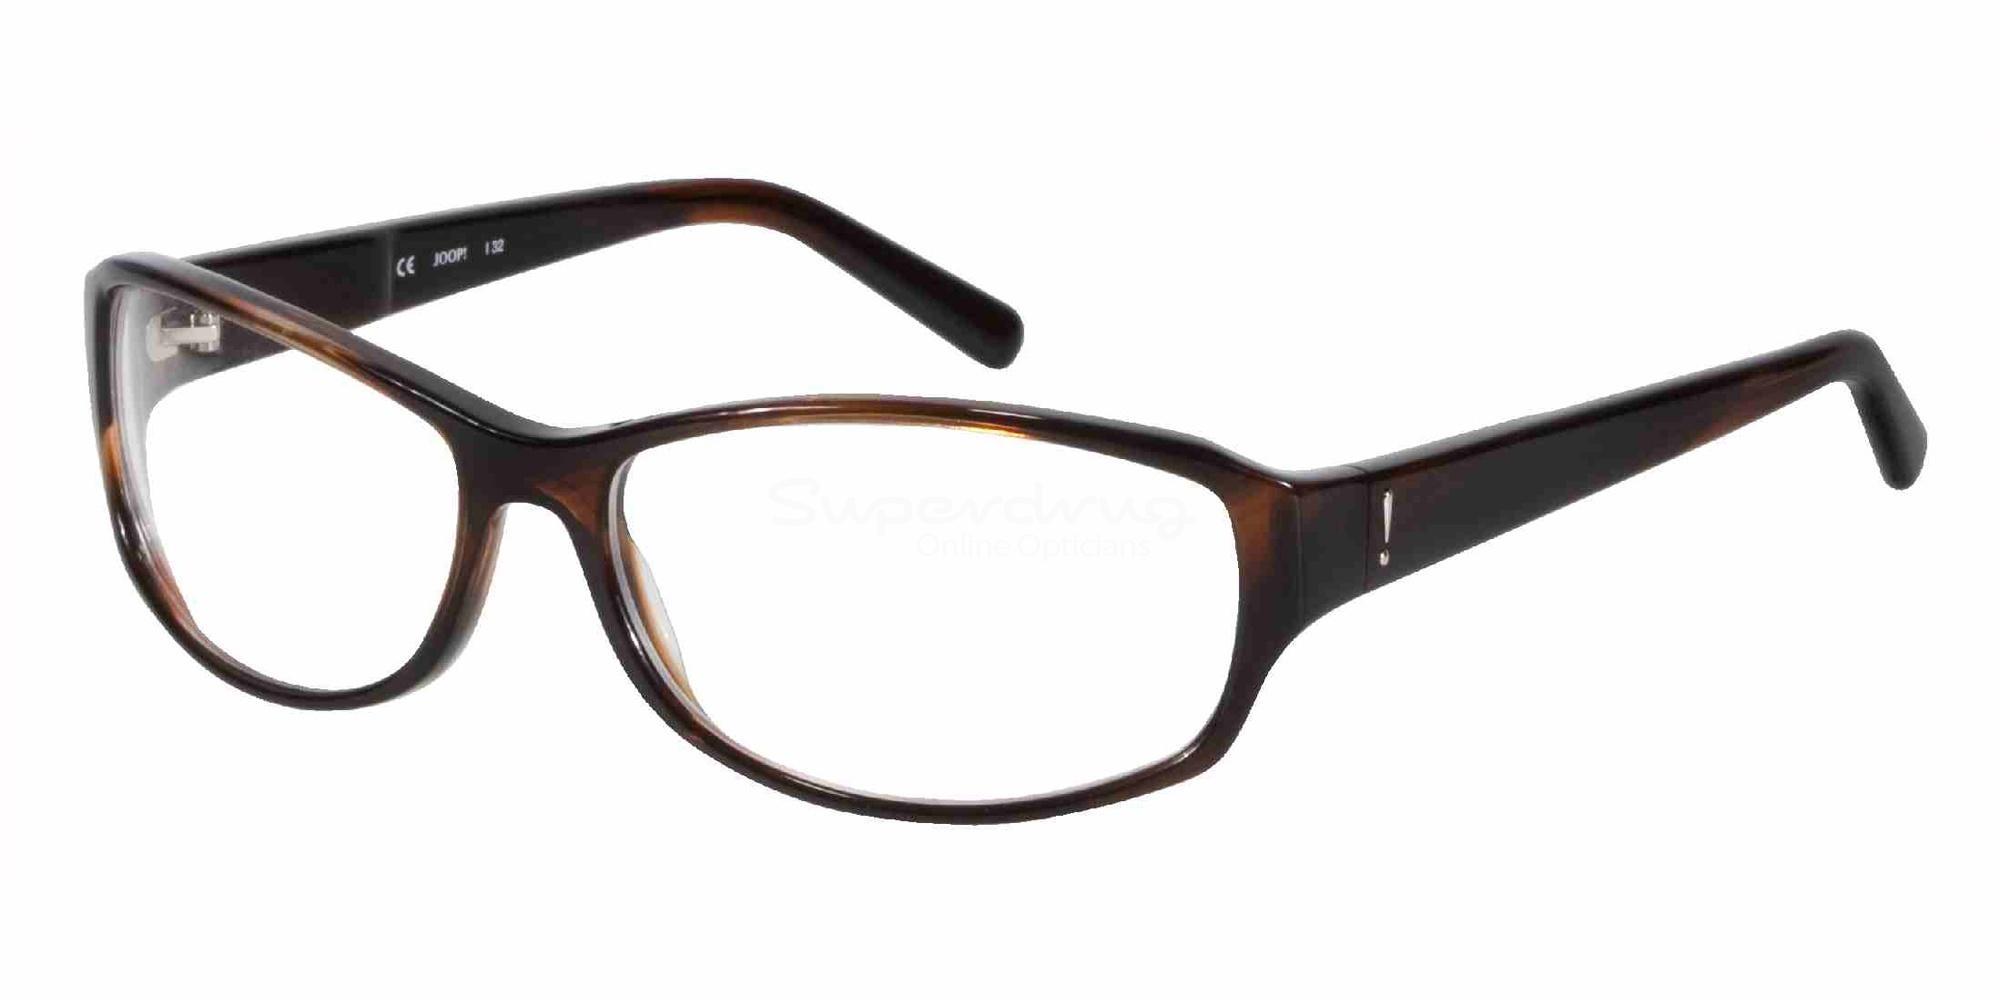 6315 81046 , JOOP Eyewear